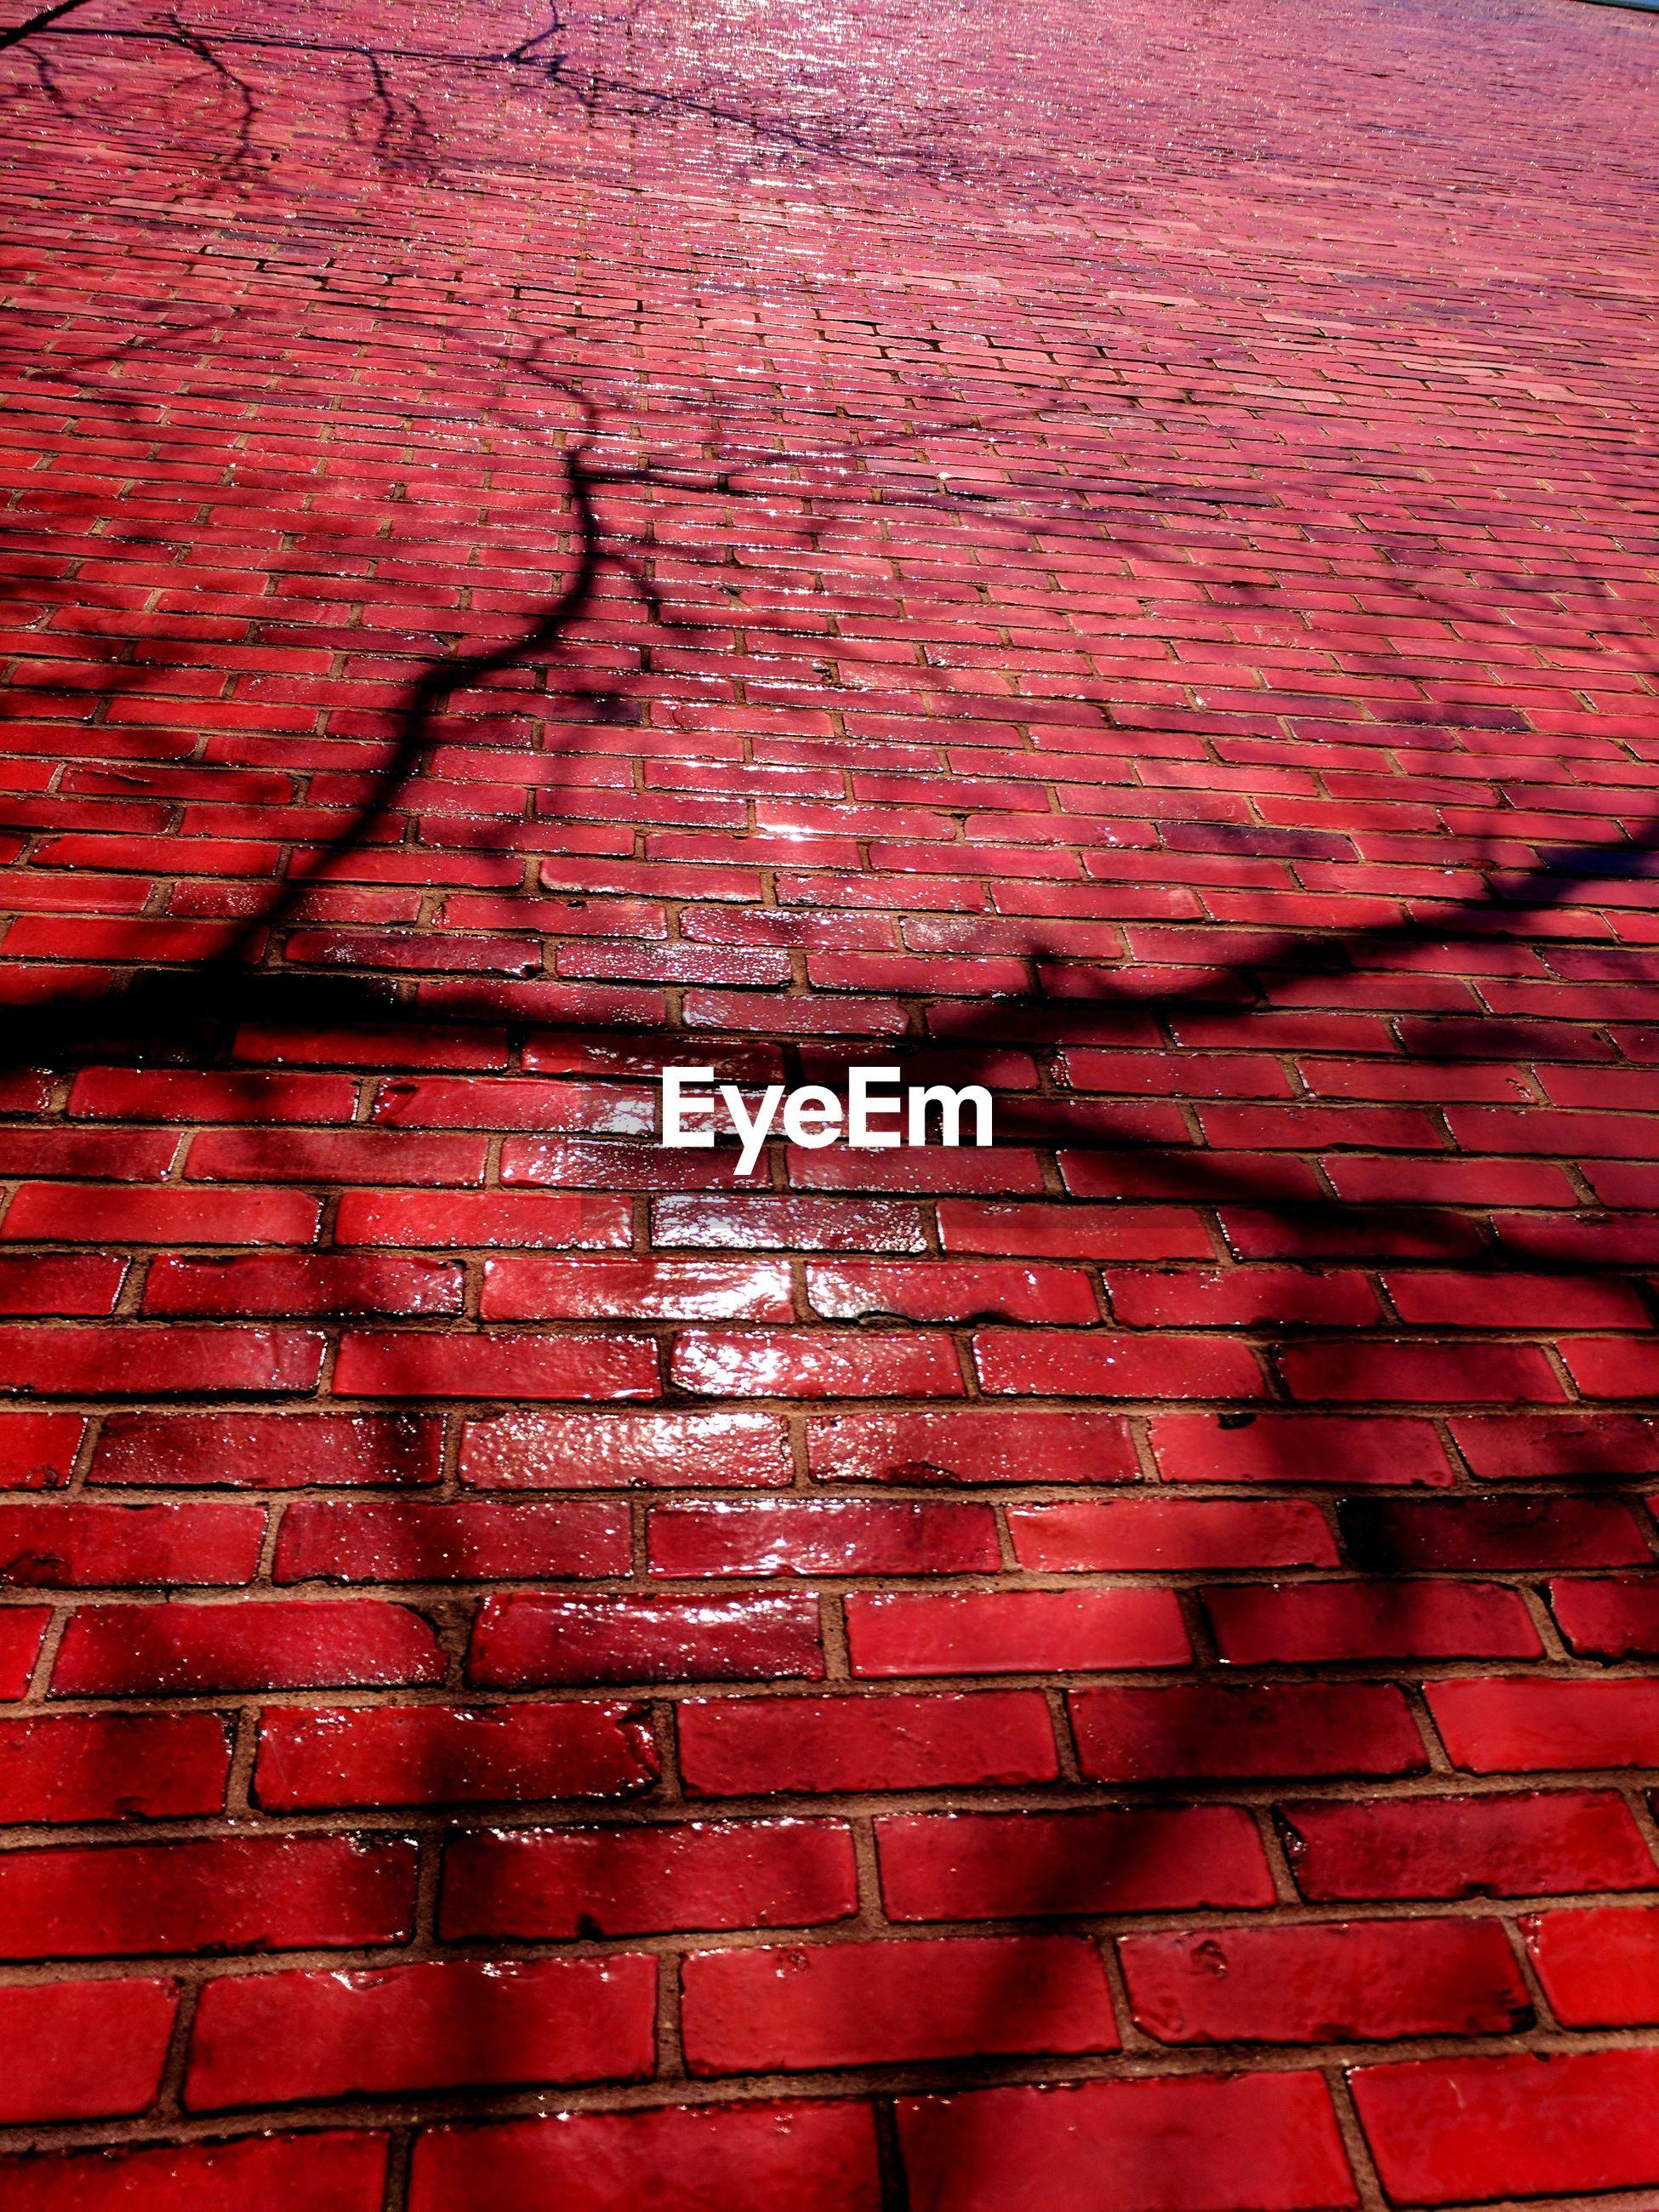 Shadow of trees on brick wall